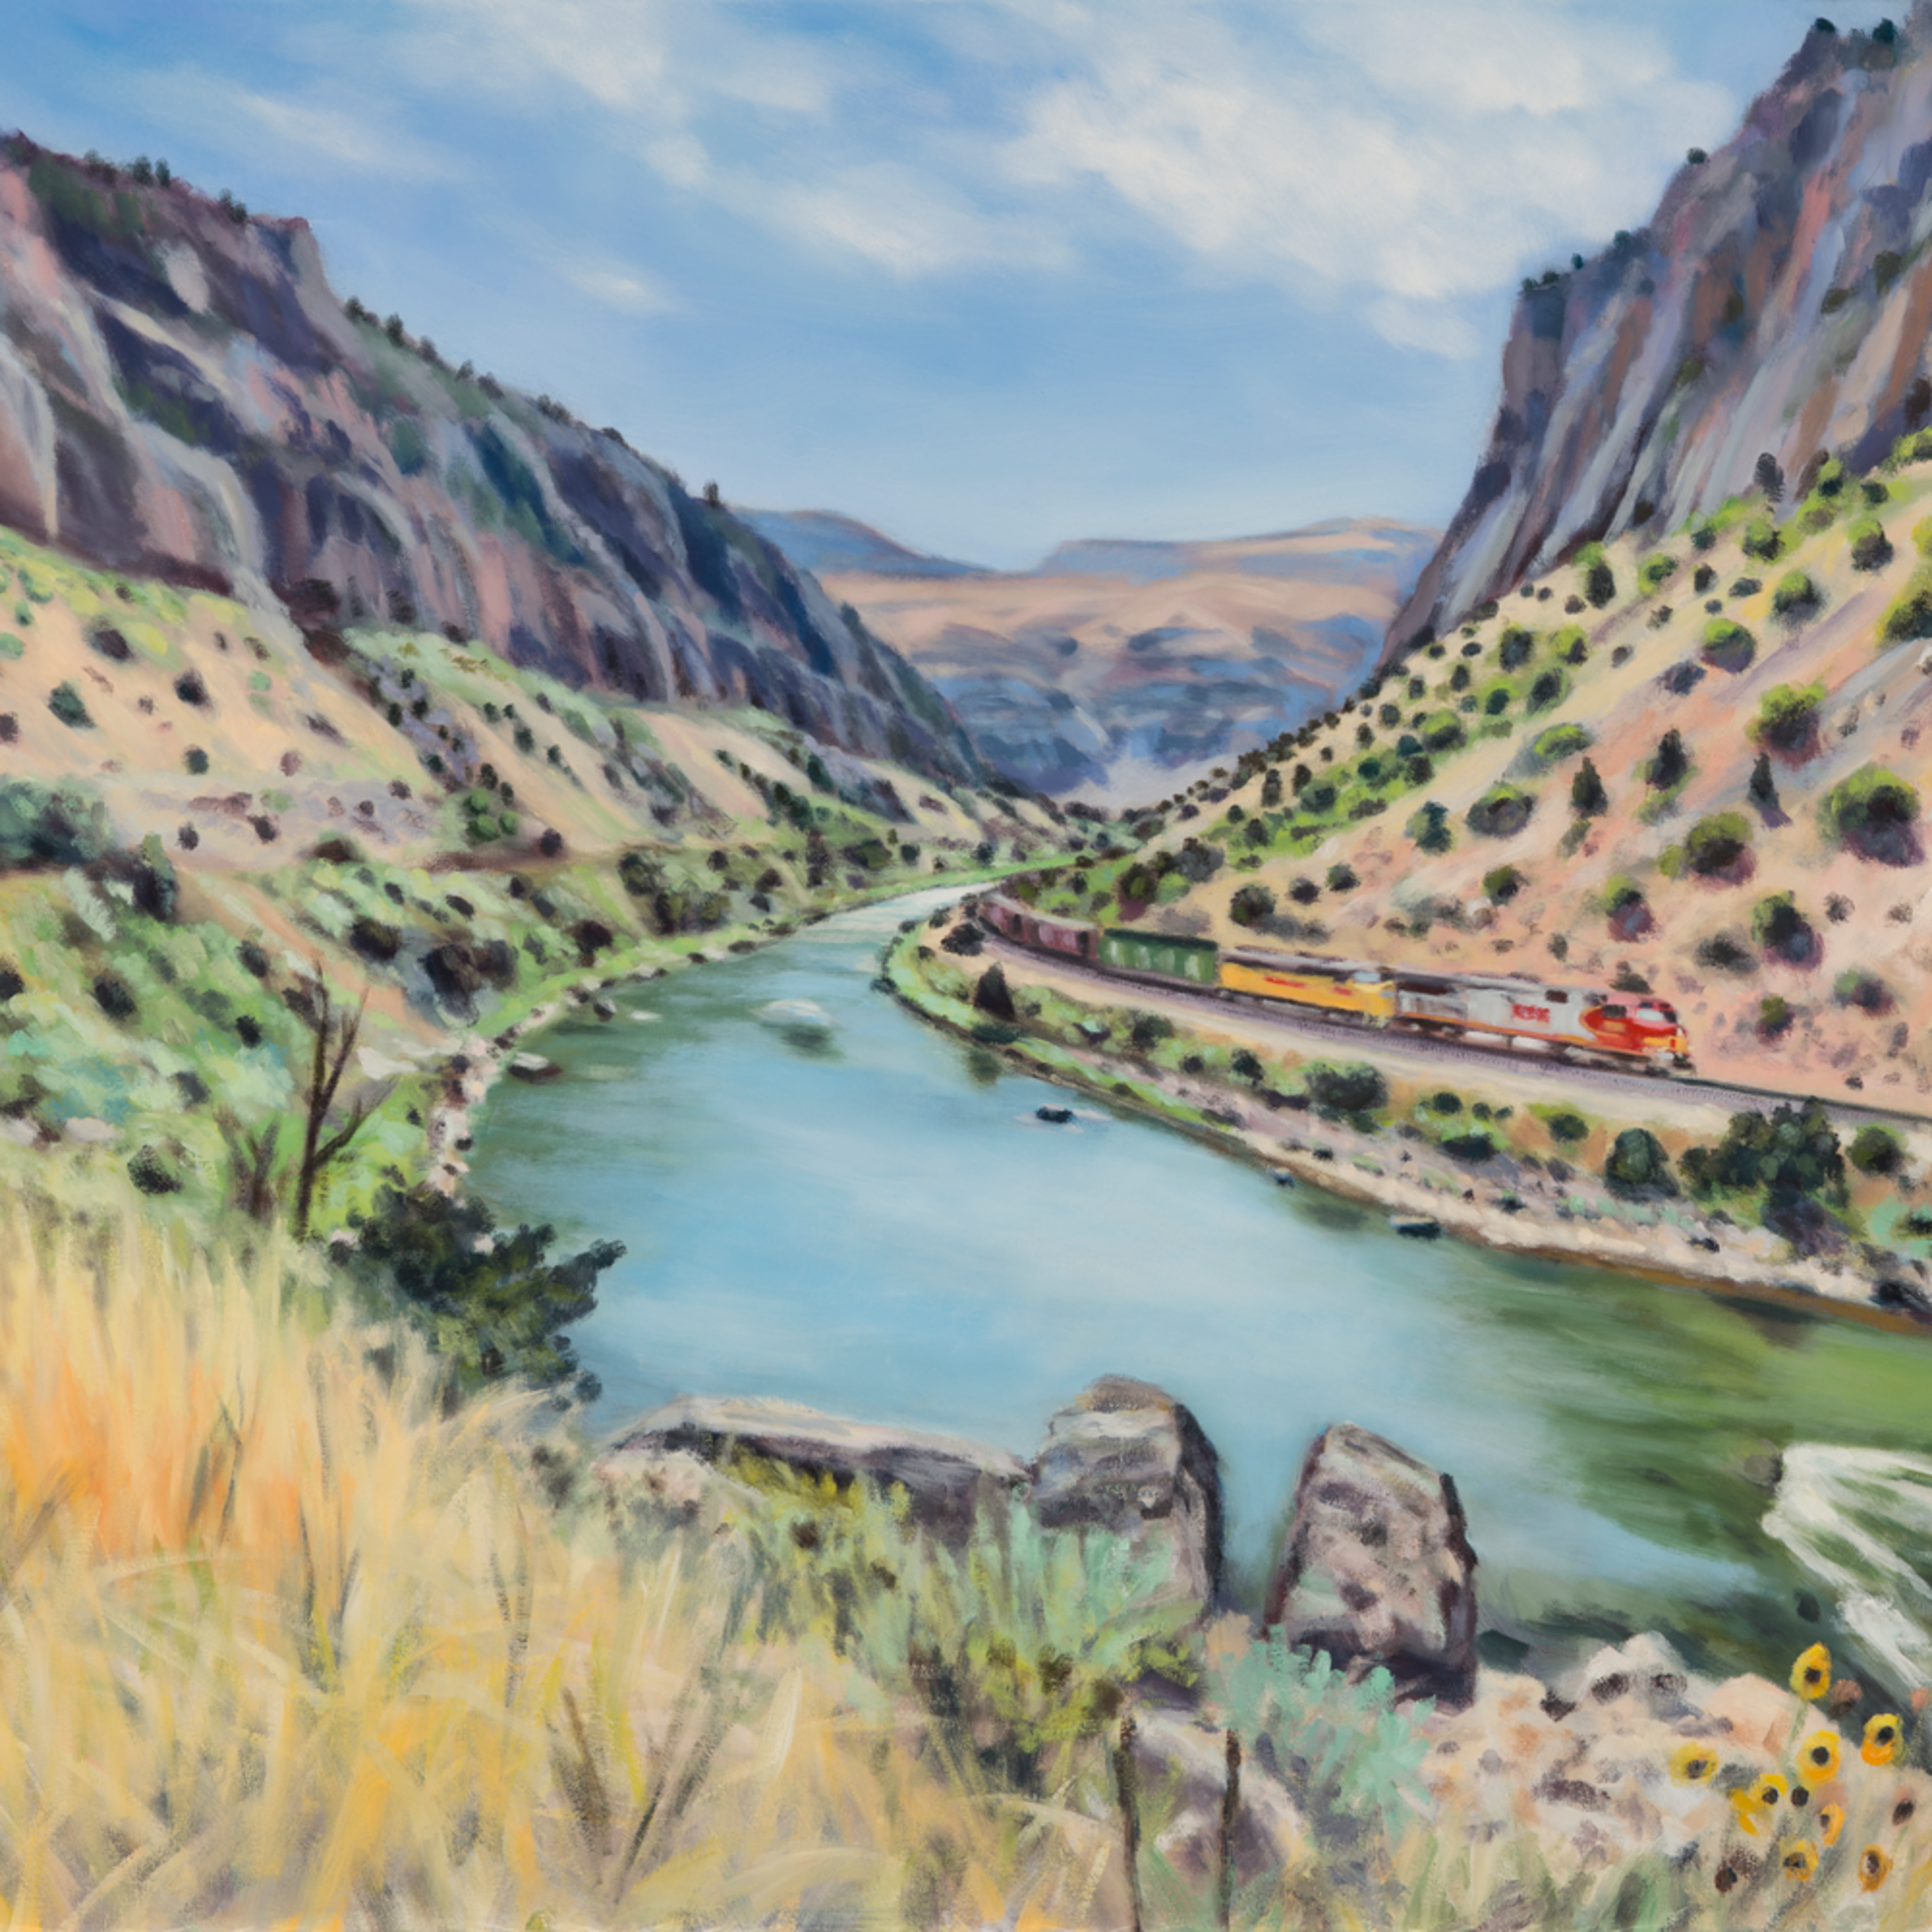 Wind river canyon ynnoe8